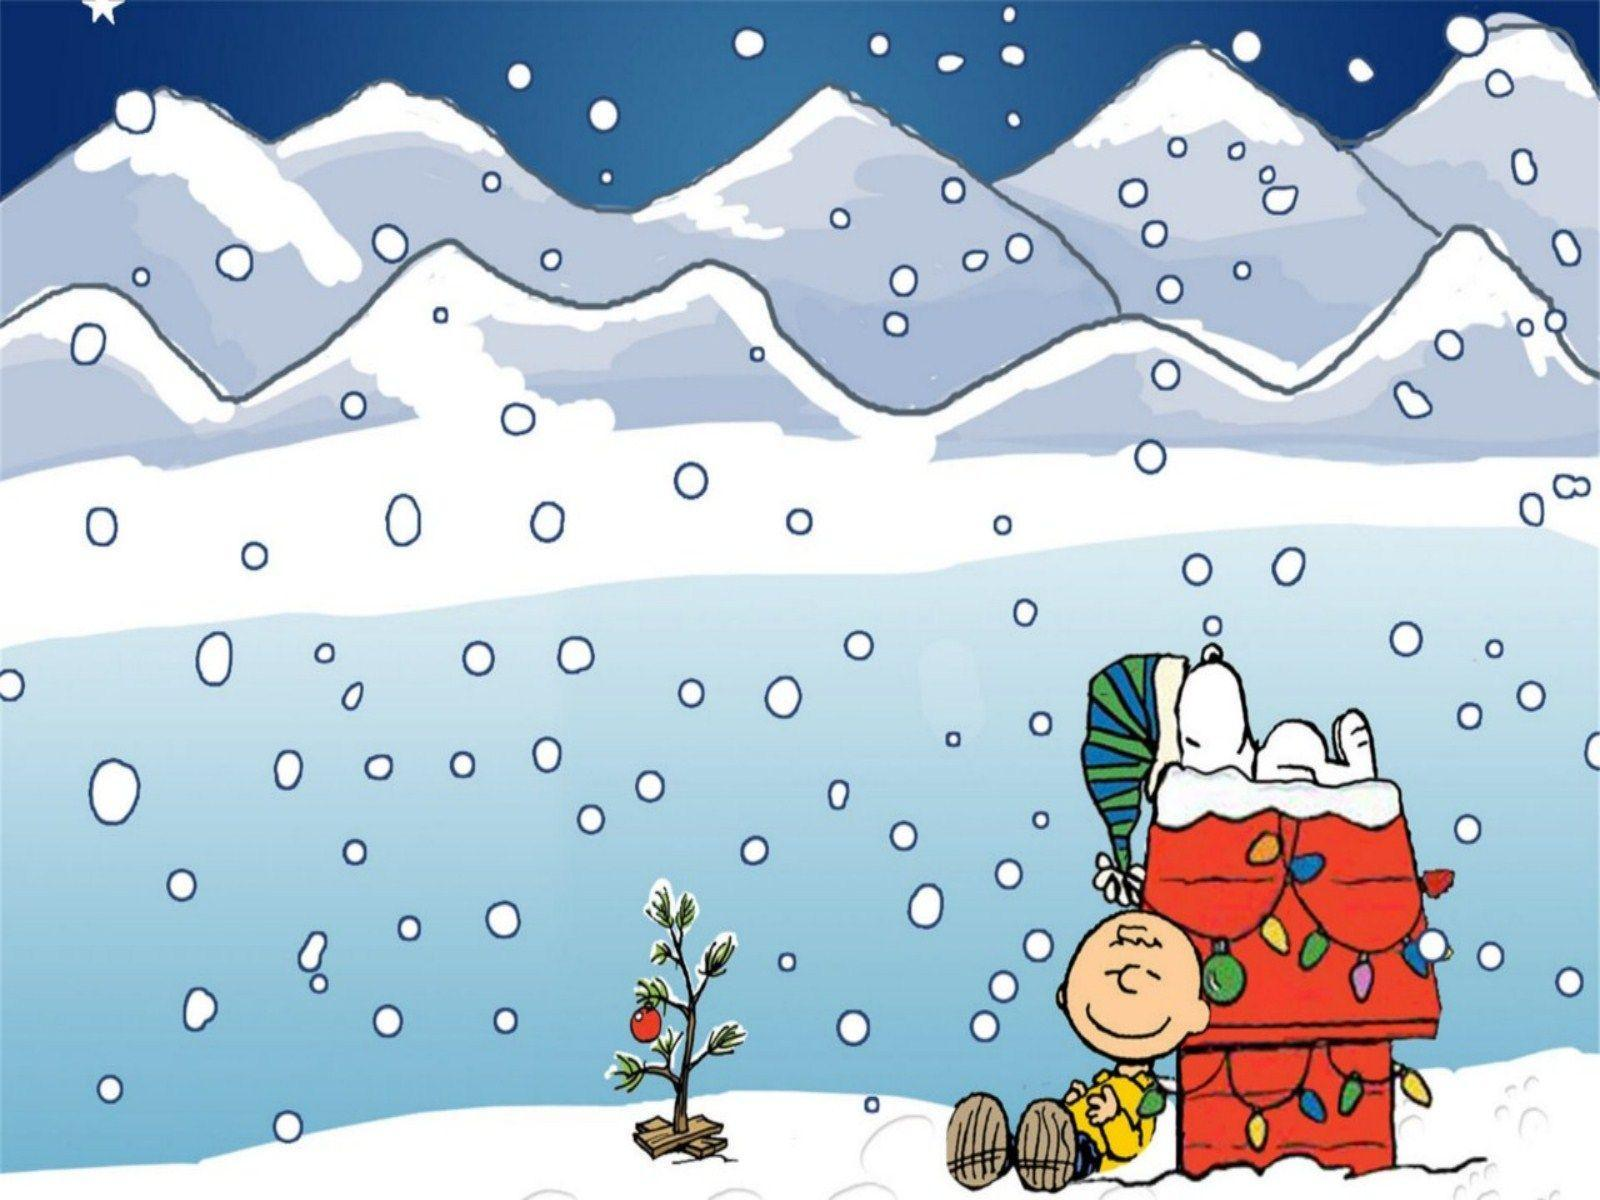 Charlie Brown Christmas Wallpapers 1600x1200